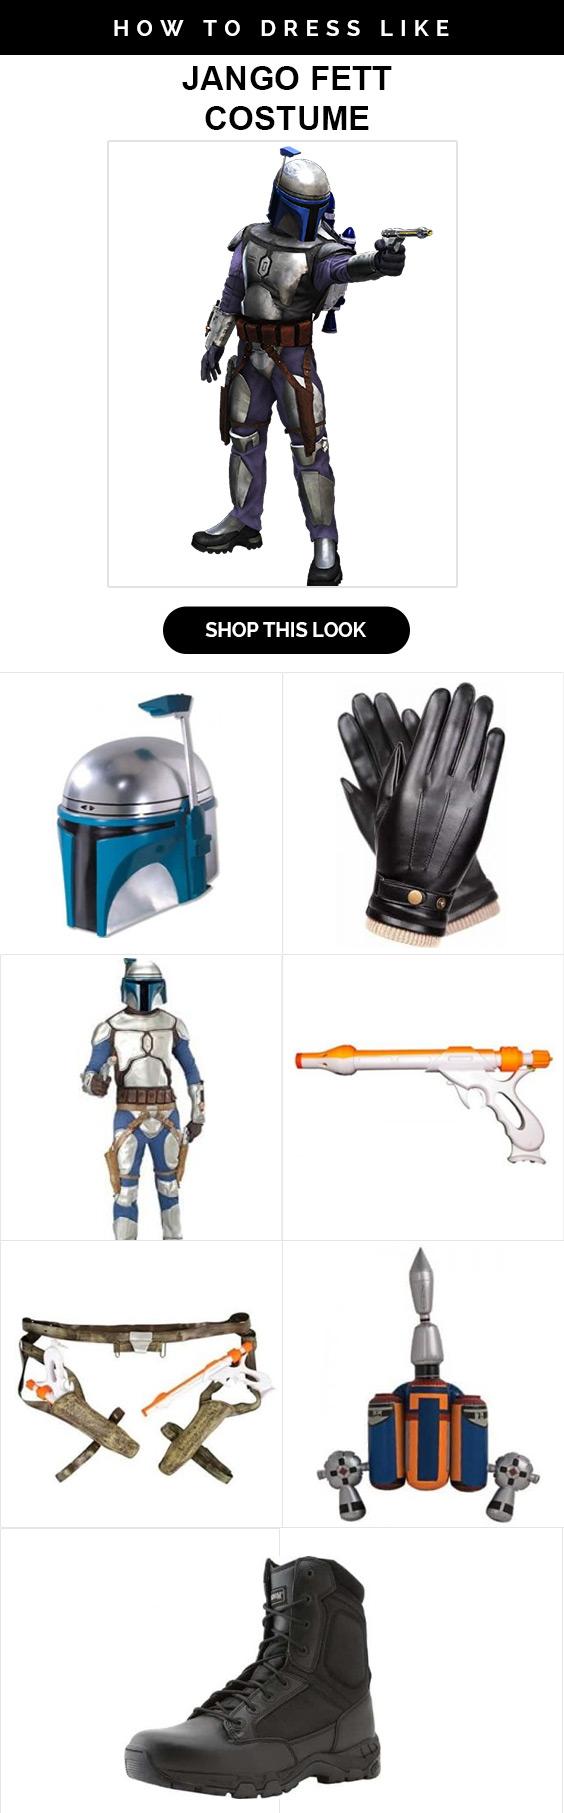 Star Wars Jango Fett Costume  sc 1 st  USA Jacket & Star Wars Jango Fett Costume Lets You Dwell in Target Kill Zones